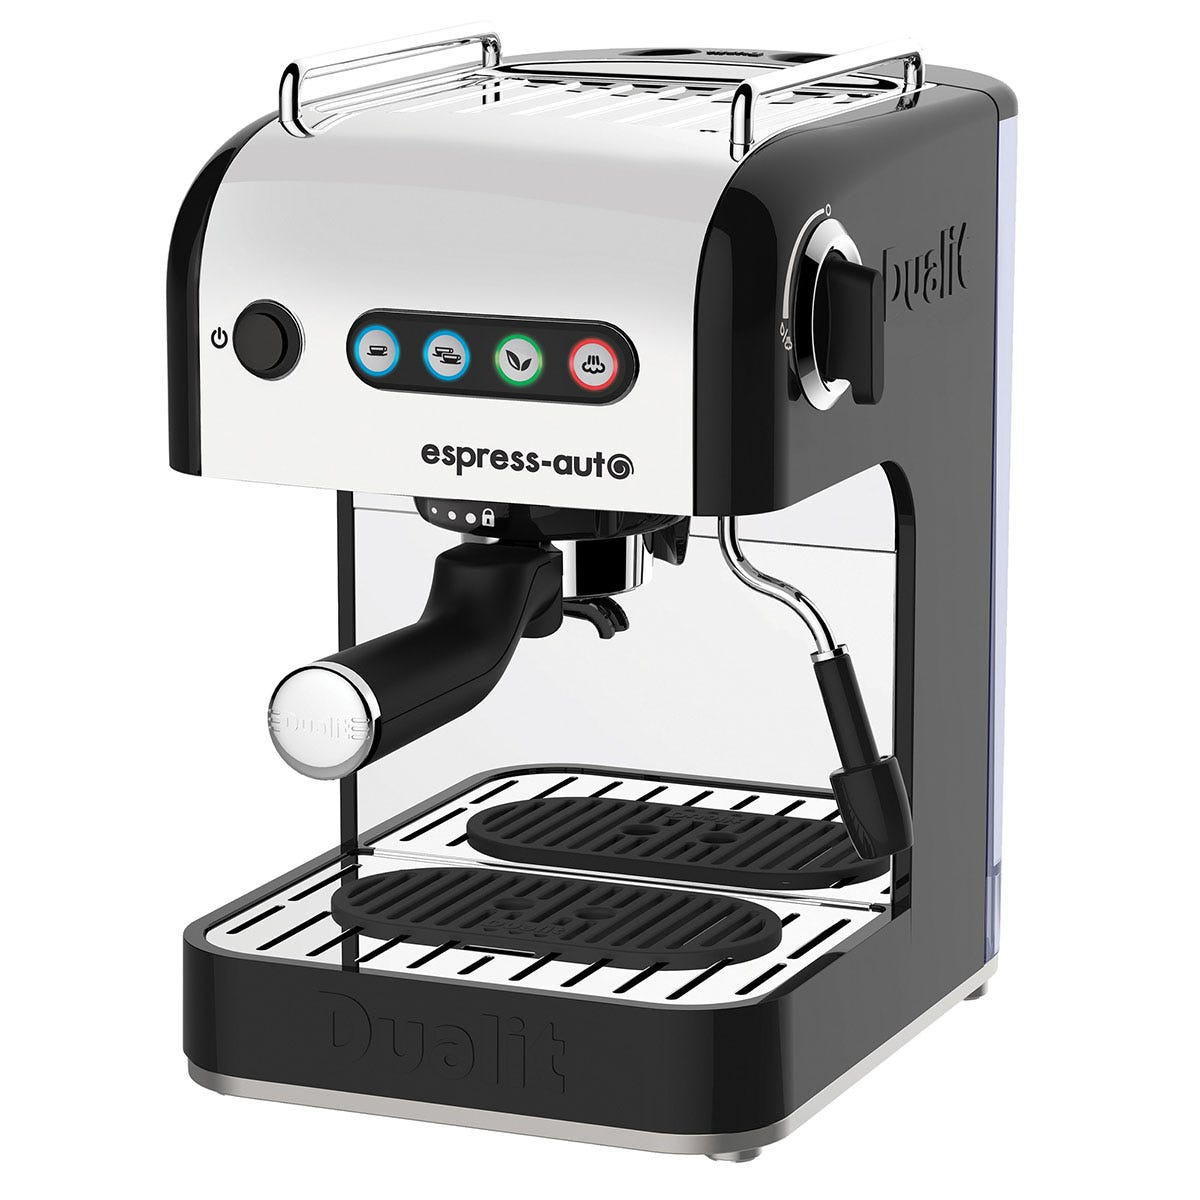 Dualit DA4516 Espresso-Auto Coffee and Tea Machine - Stainless Steel and Black